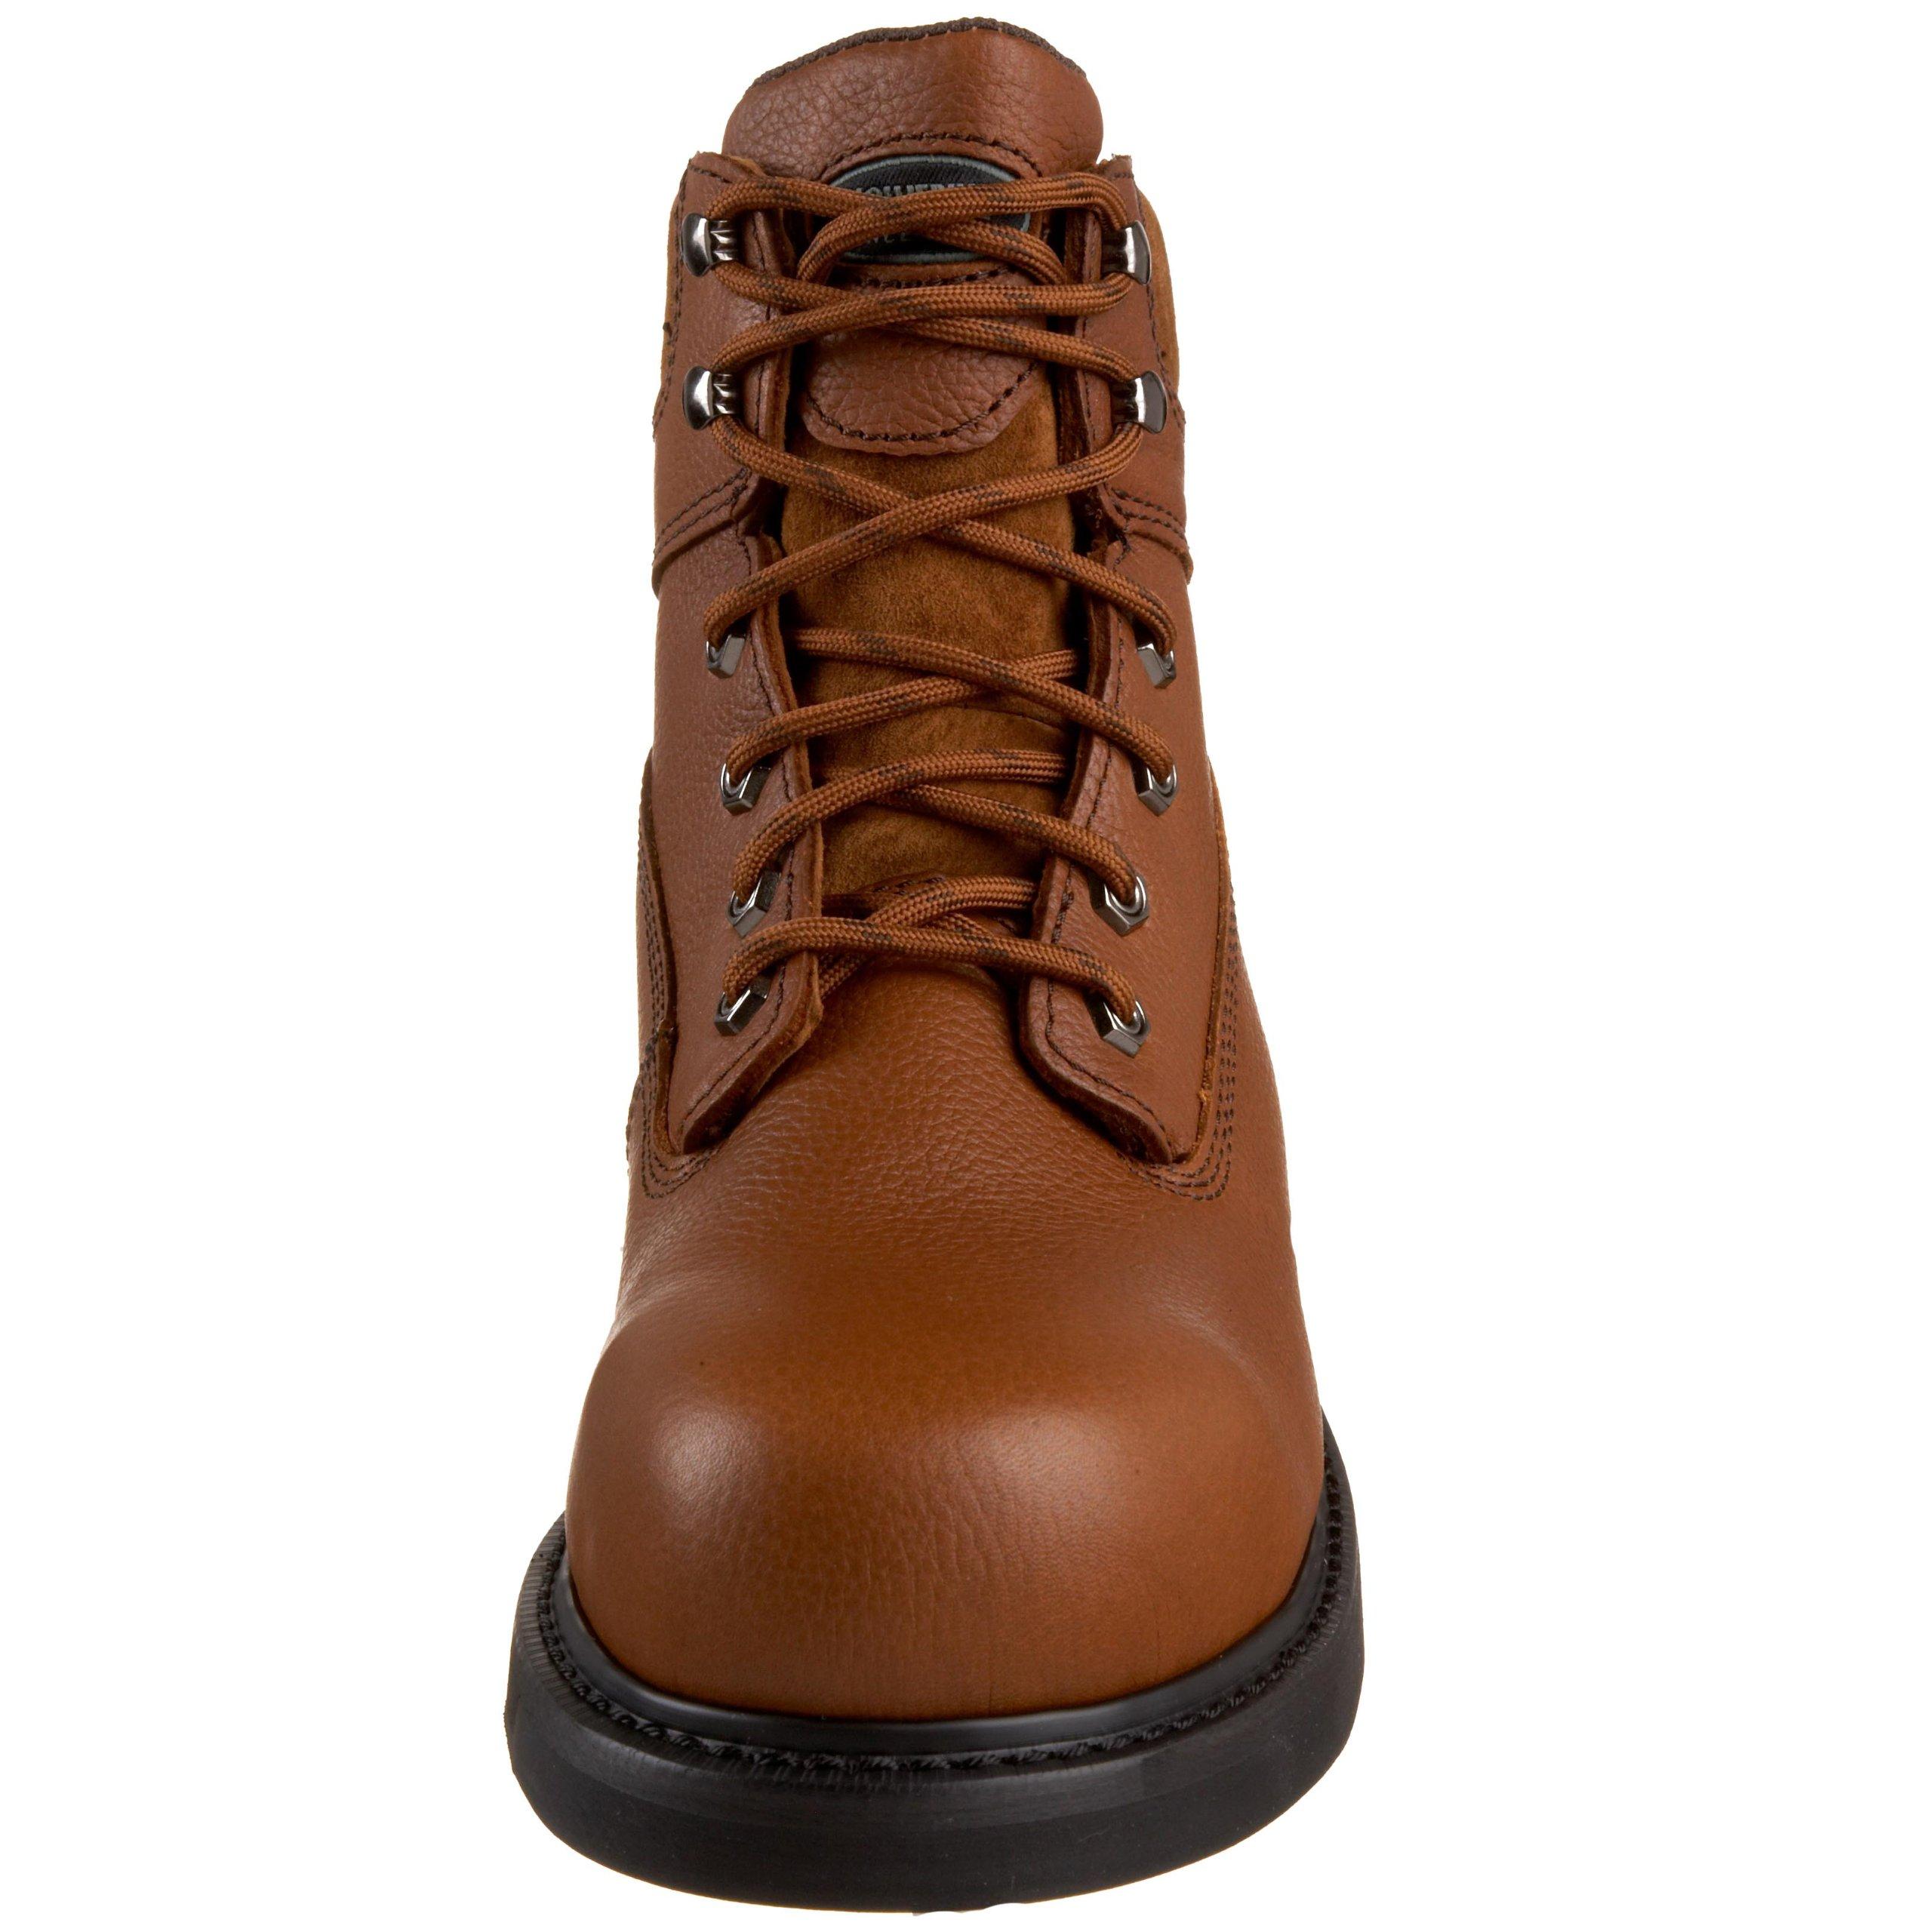 Wolverine Men's W02564 Durashock Boot, Brown, 7 M US by Wolverine (Image #4)